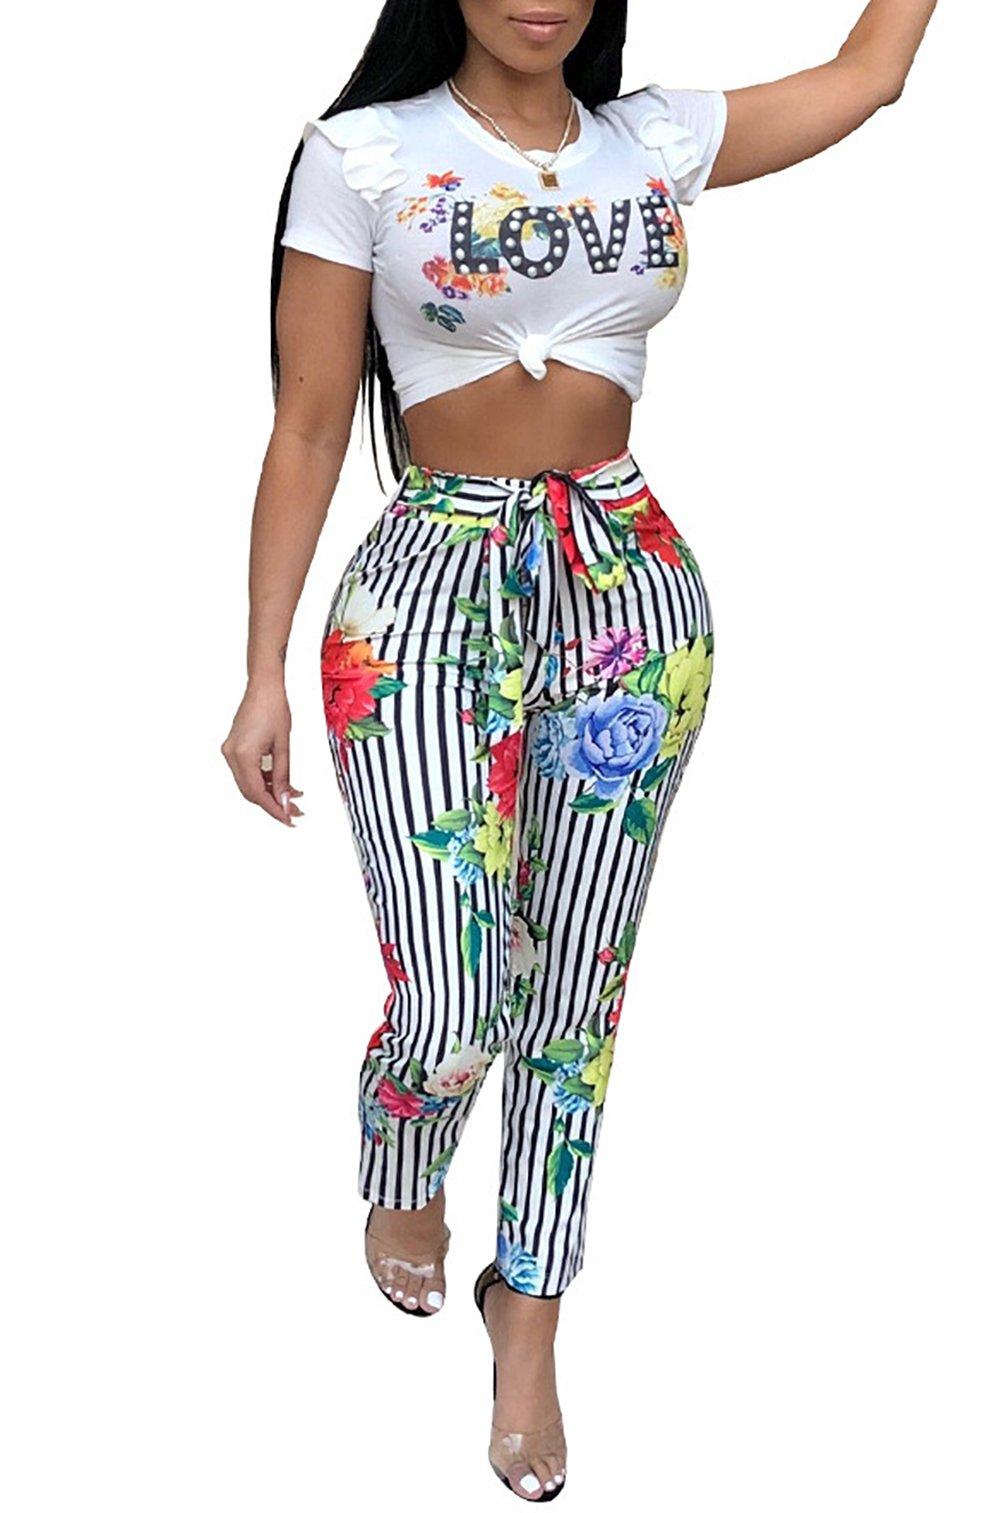 Molisry Women Floral Print Striped Sweatshirt Short Sleeve Crop Top Jumpsuits 2 Piece Outfits